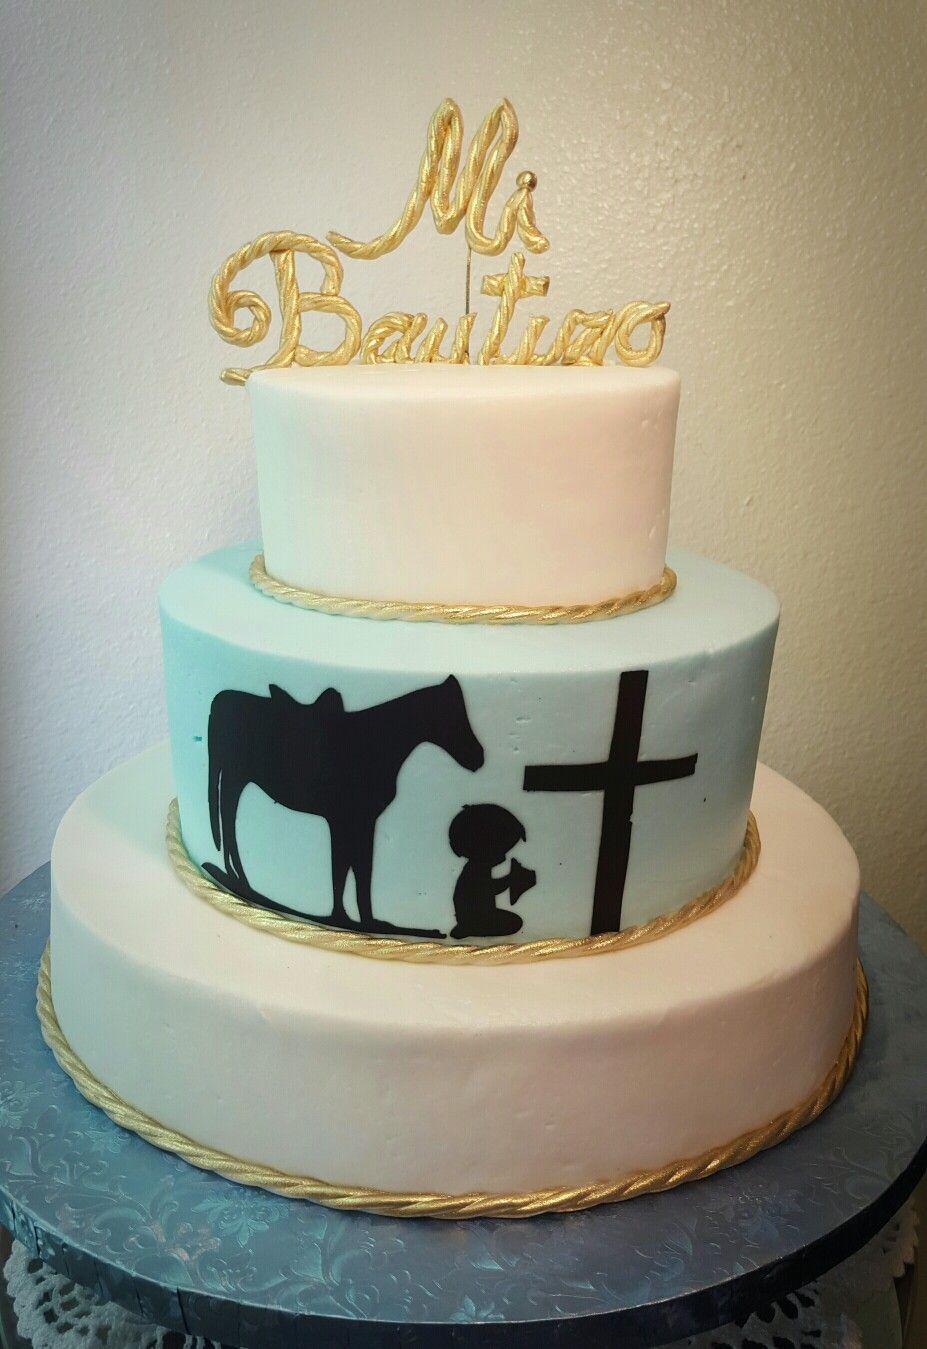 Mi Bautizo My Christening Cake Lady D Cakes Boy